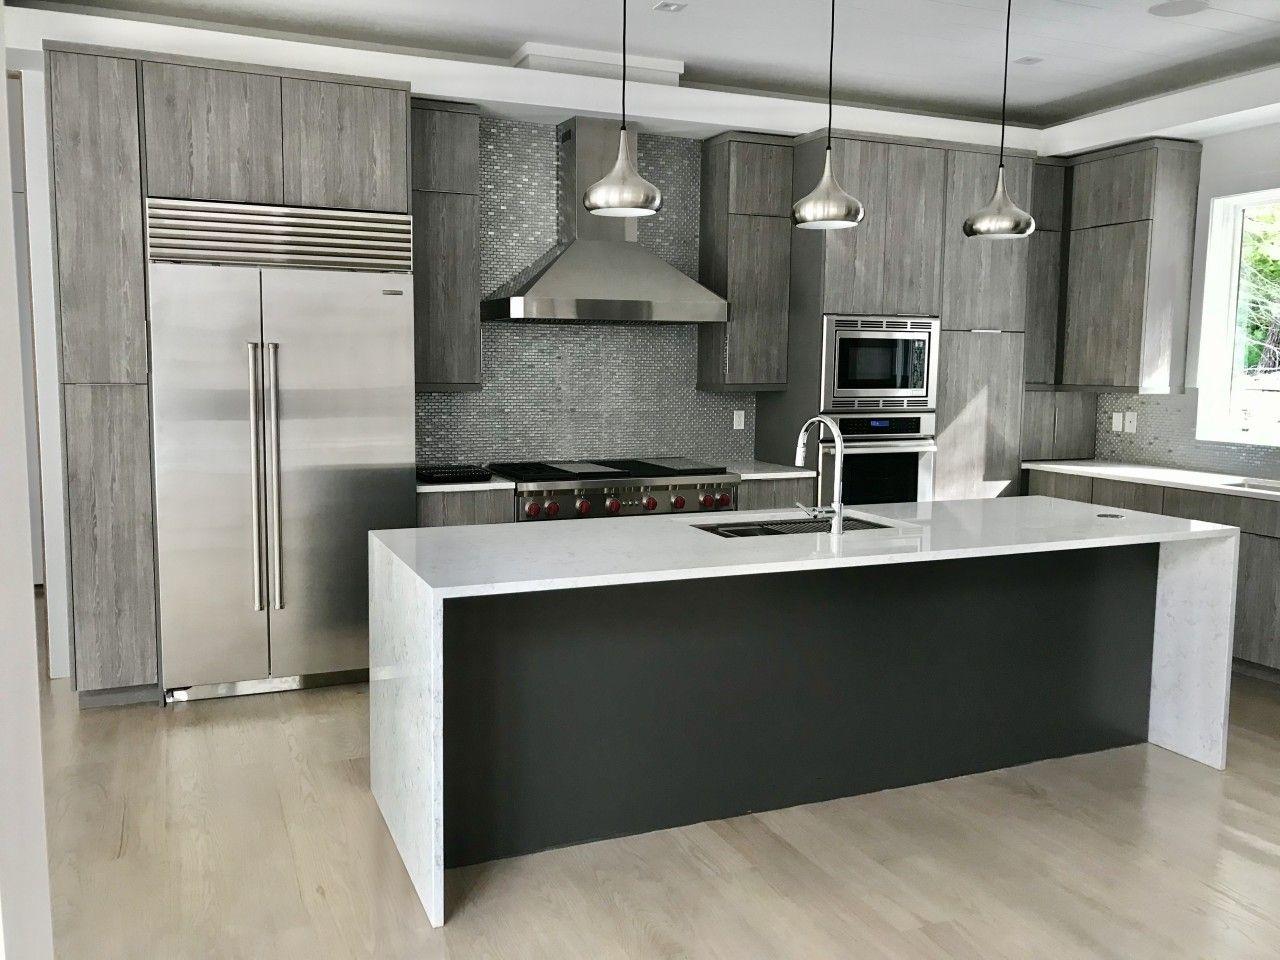 We Love This Grey Textured Modern Kitchen With Complimentary Secondary Tones Greytextured Waterfallisland Contemporary Kitchen Modern Kitchen Kitchen